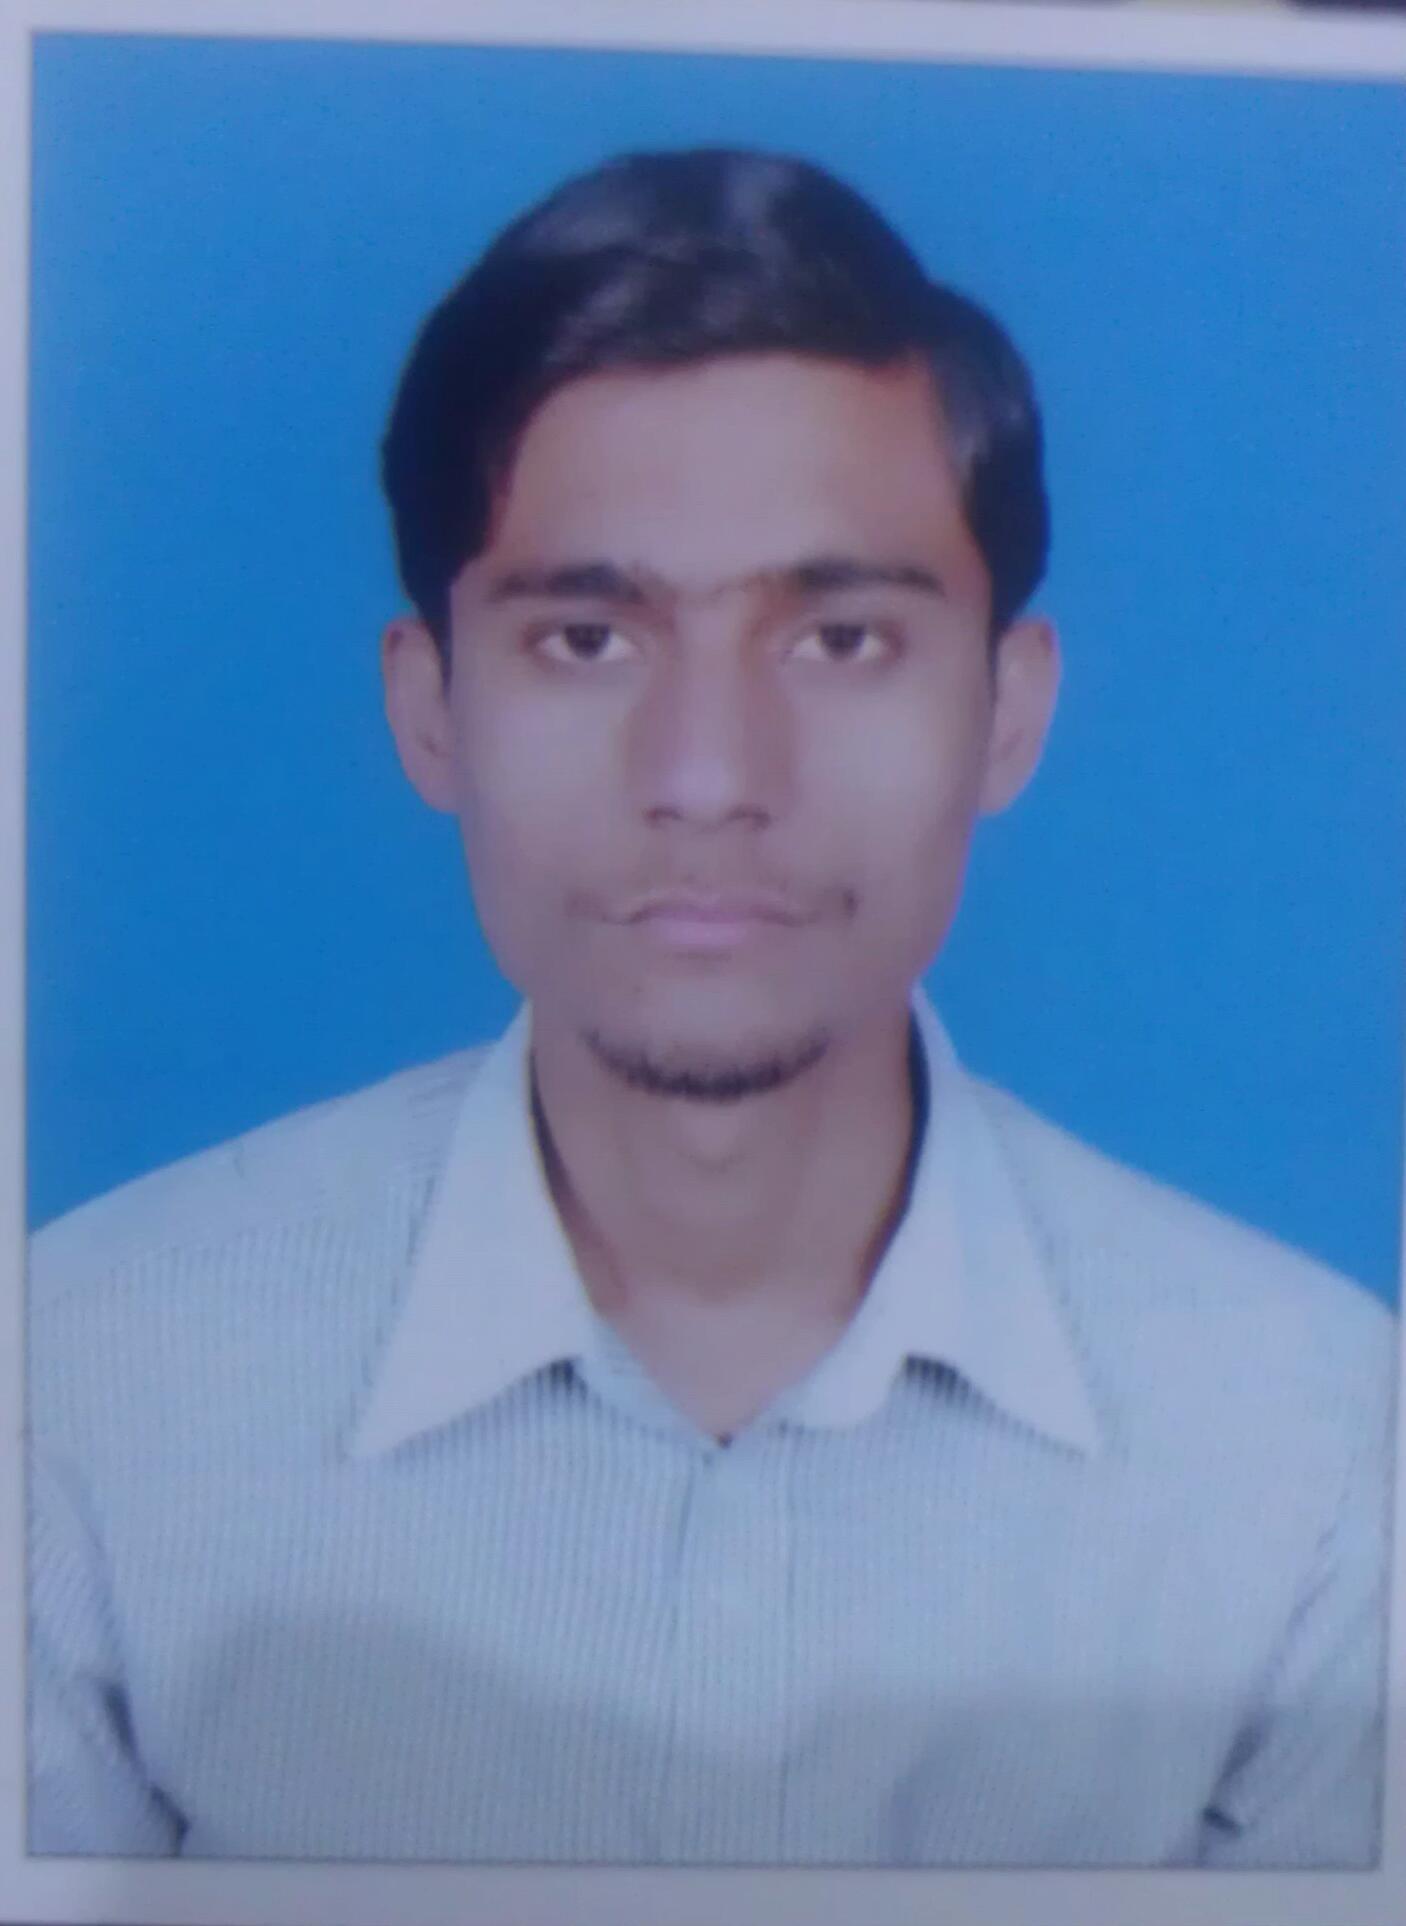 Syed Abdurrehman Photoshop